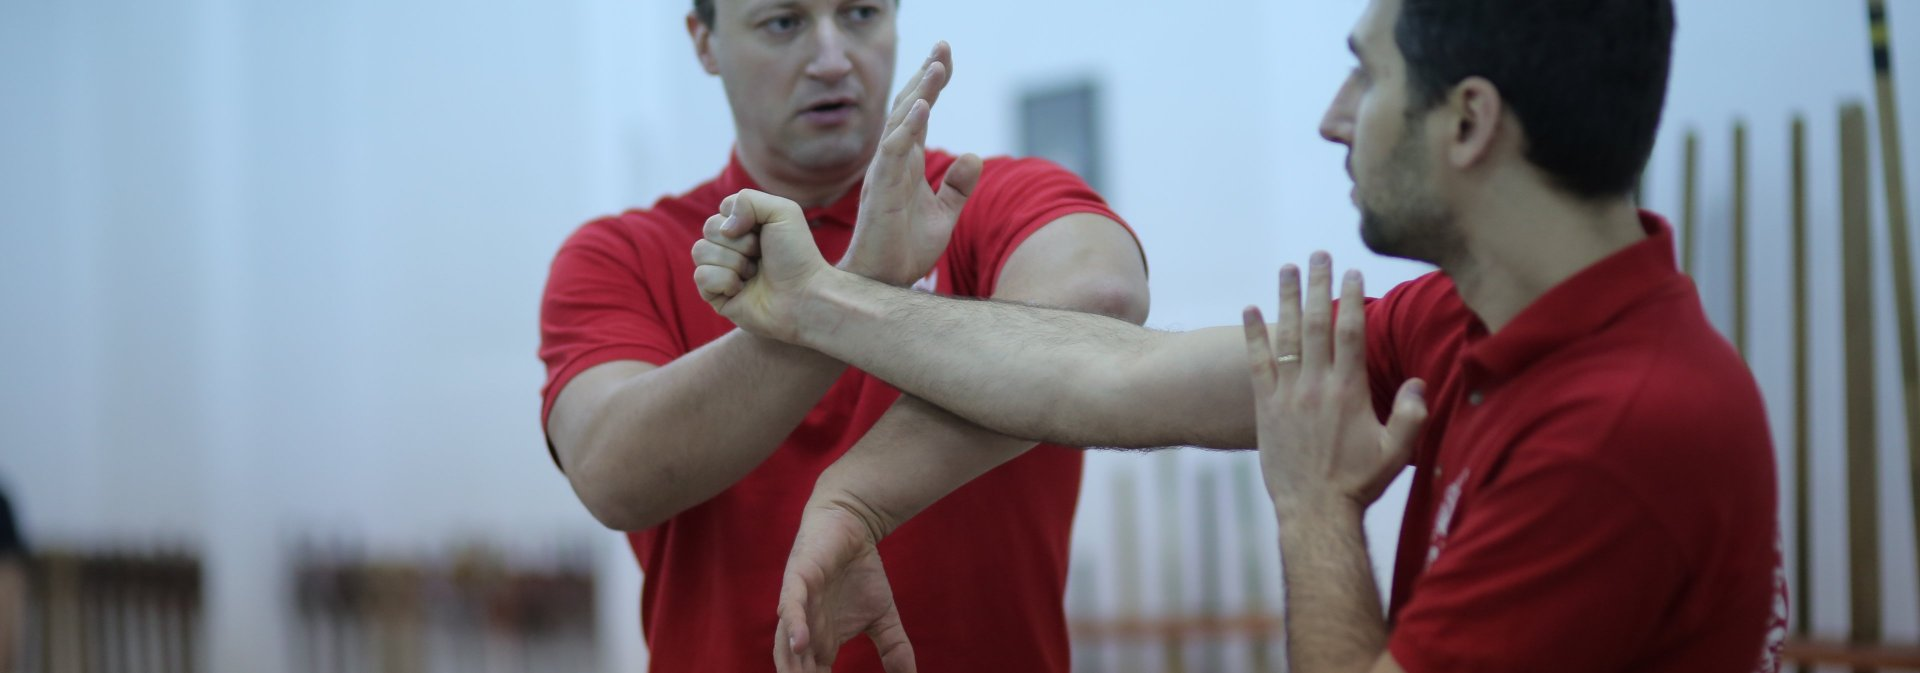 Școala de Kung Fu Wing Tsun, Iași